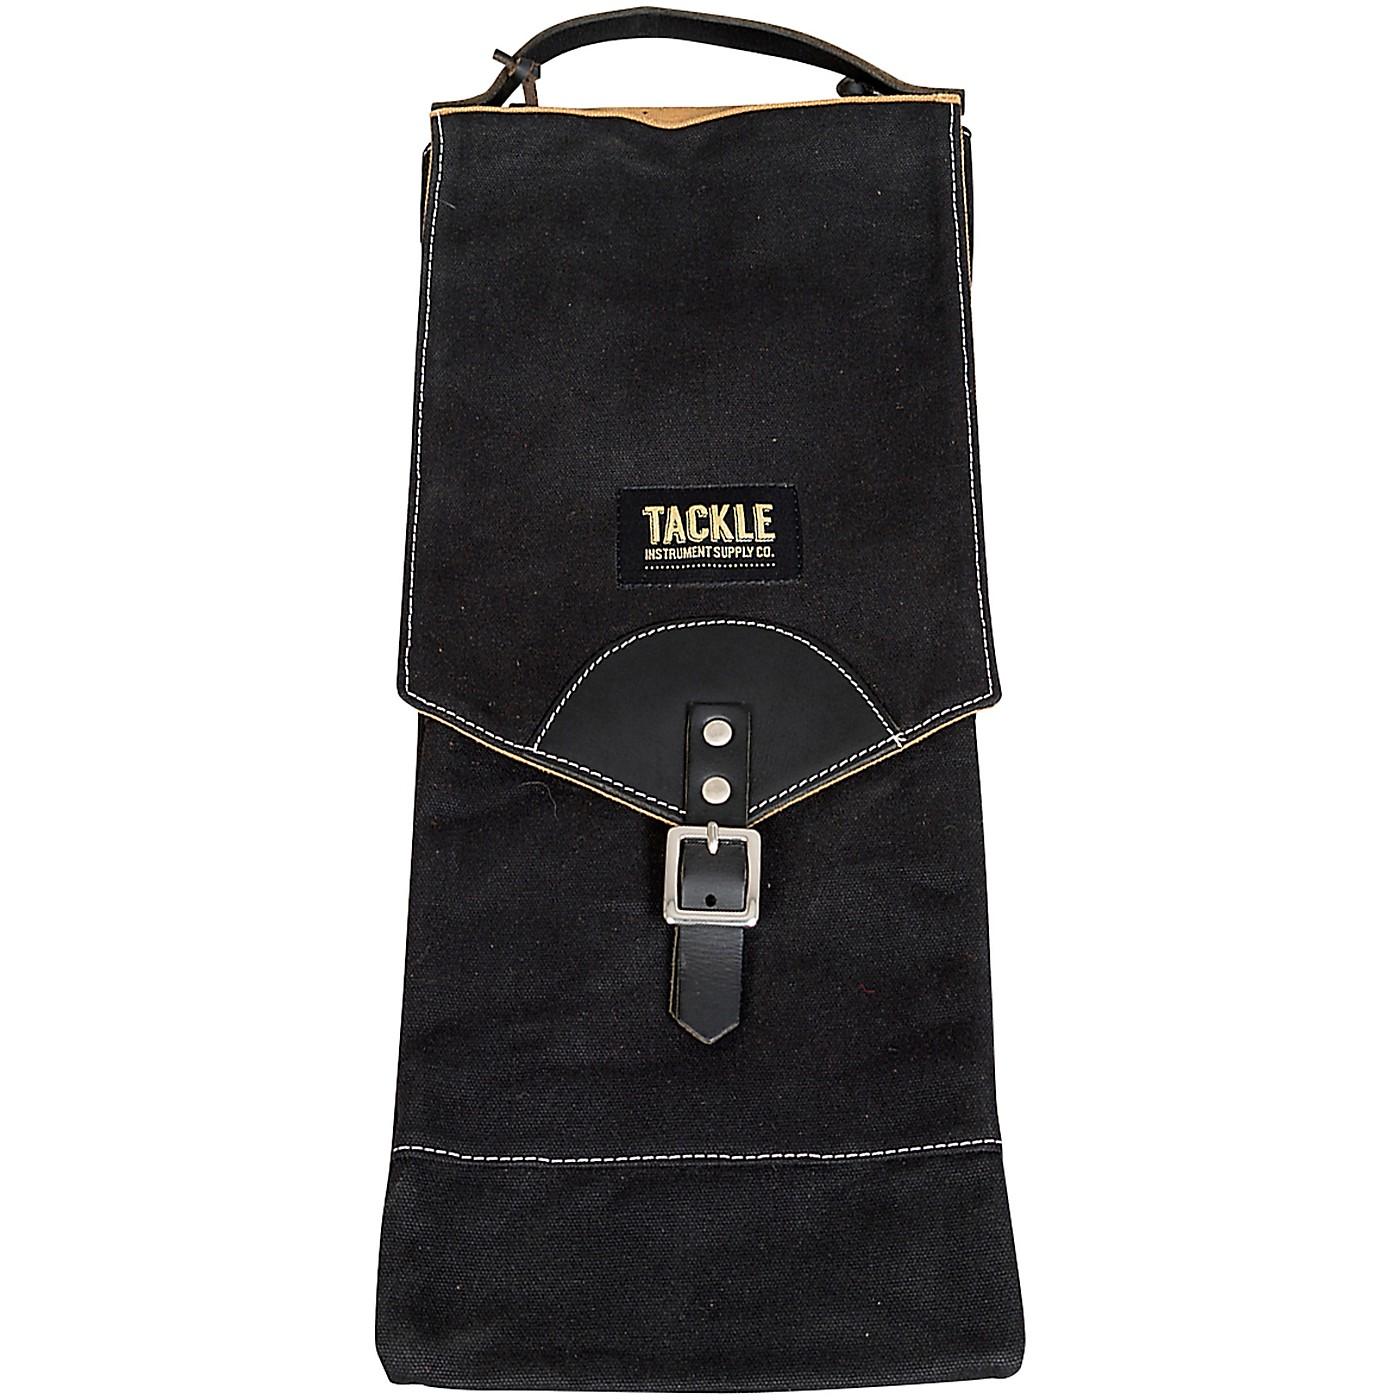 Tackle Instrument Supply Black Waxed Canvas Compact Stick Bag thumbnail